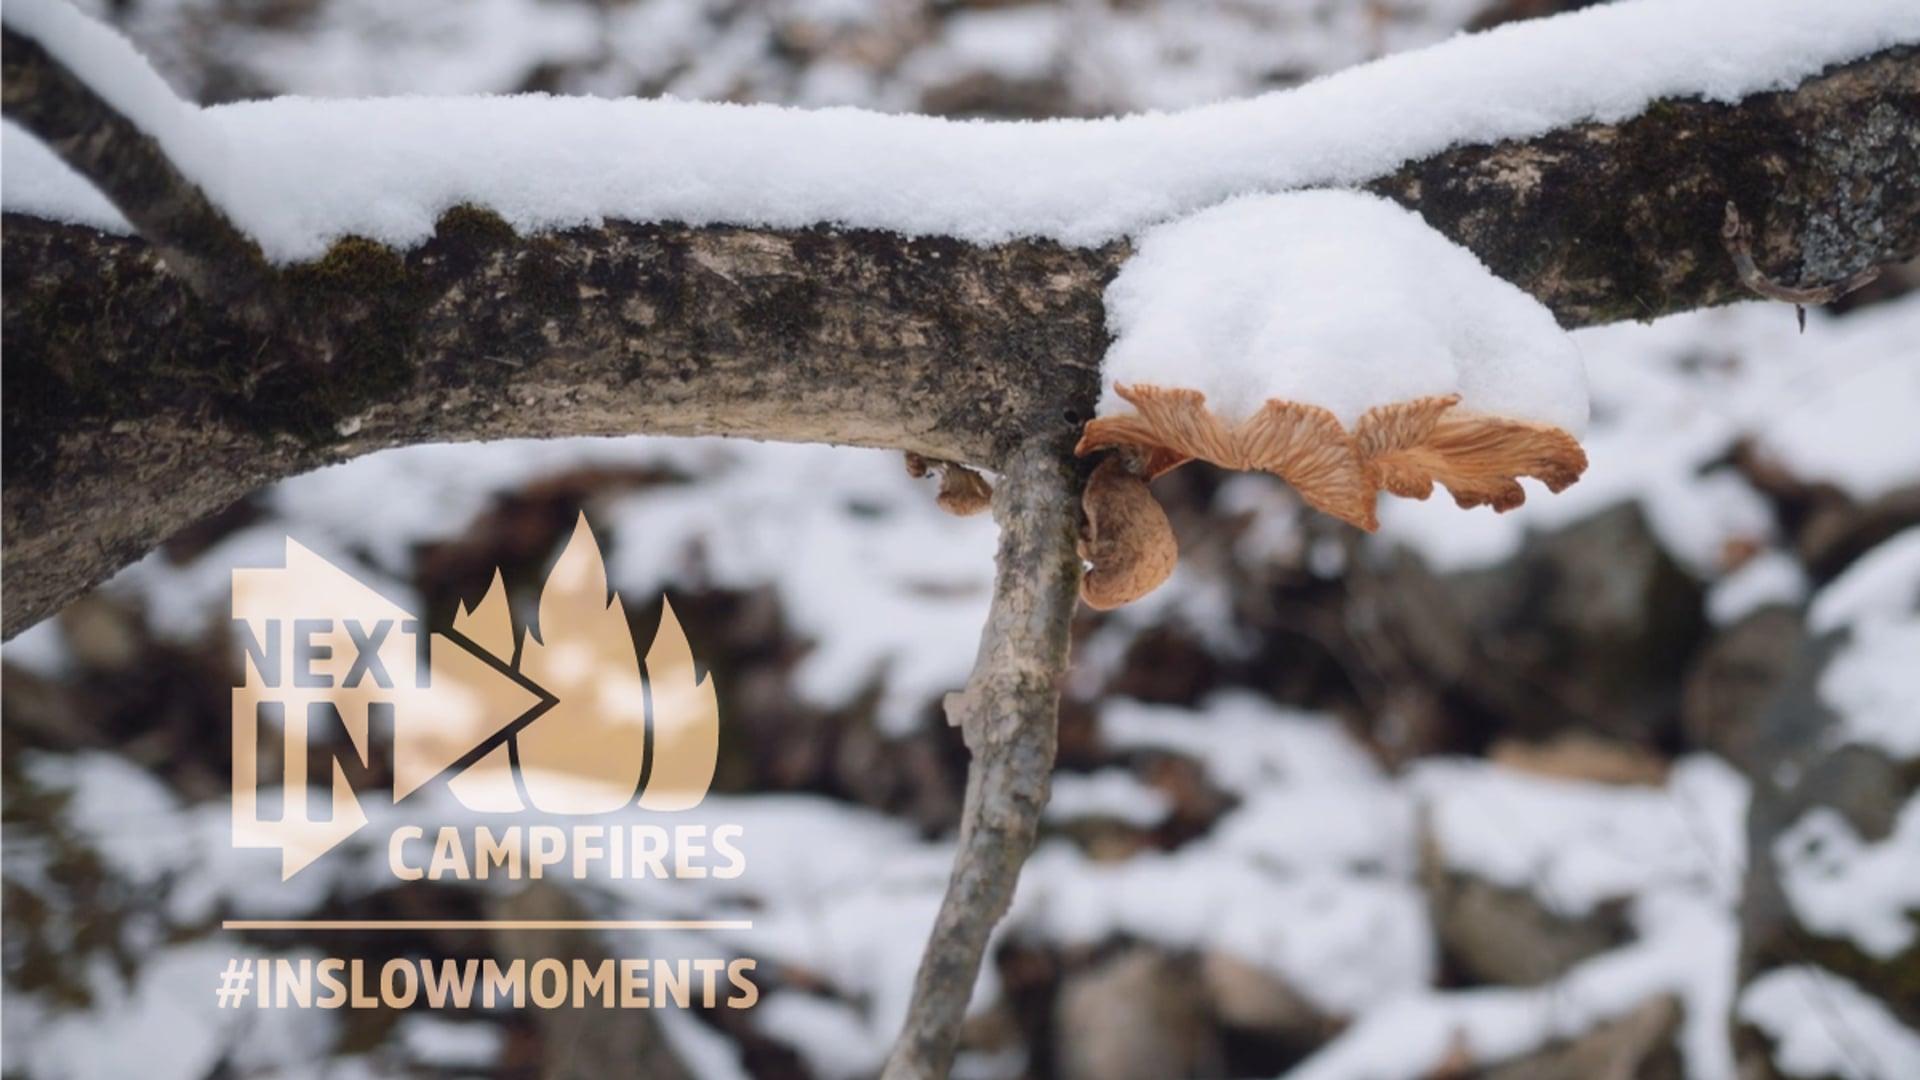 Next Indiana Campfires Slow Moments